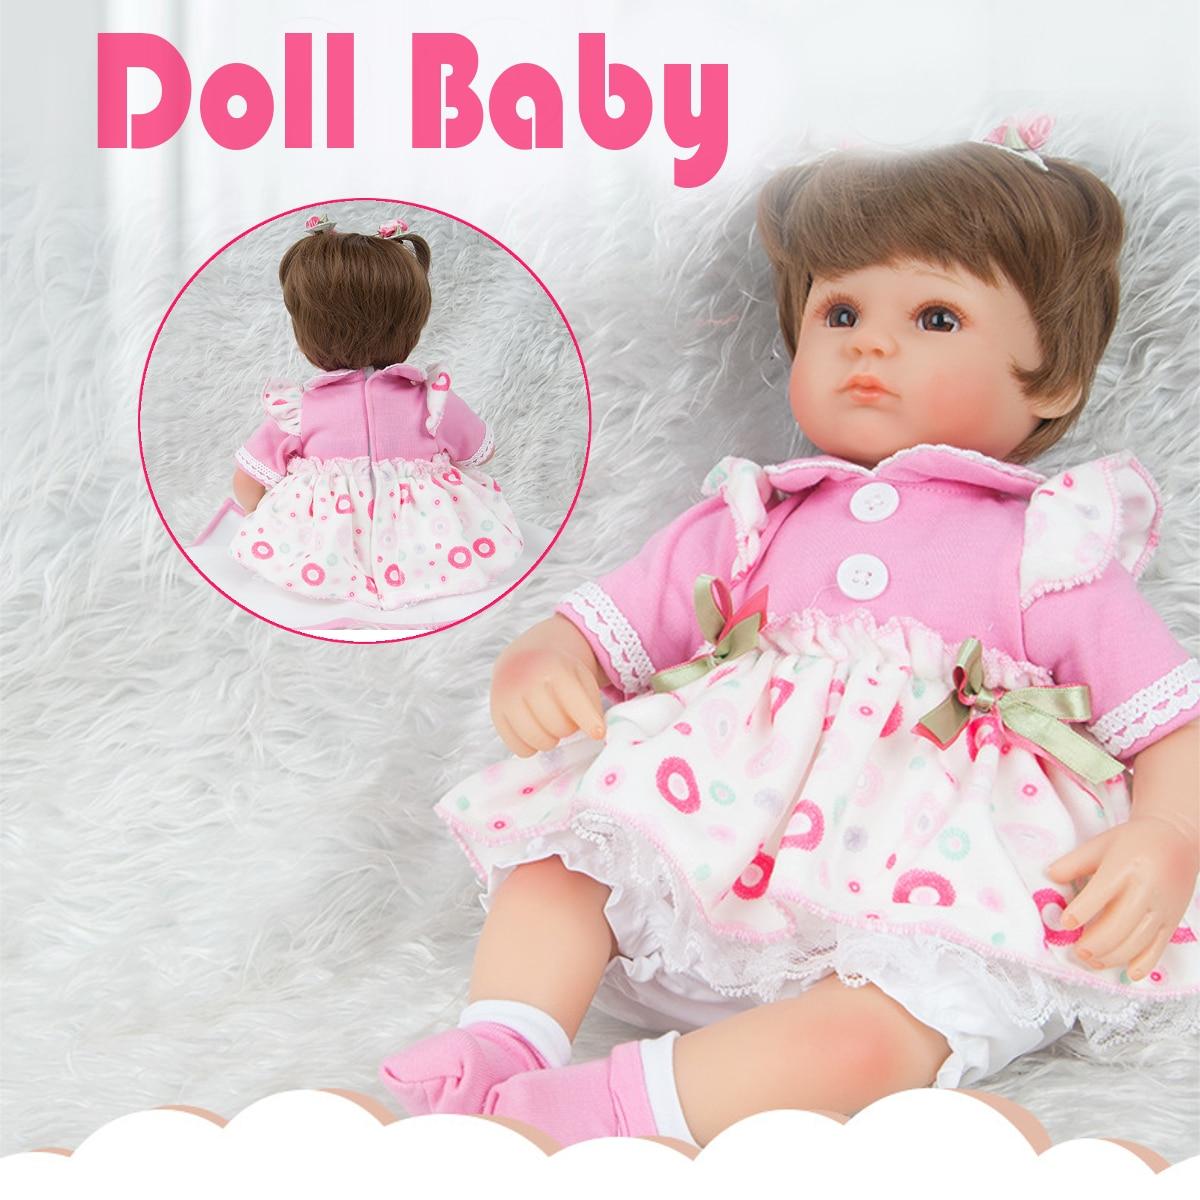 22 inch 55cm Handmade Lifelike Vinyl Silicone Reborn Doll Newborn Baby Girl Doll Toy Kids Chirldren's Birthday Christmas Gift christmas birthday holiday gift very cute 22 inch 55cm lifelike silicone bornbaby reborn baby boy girl dolls doll